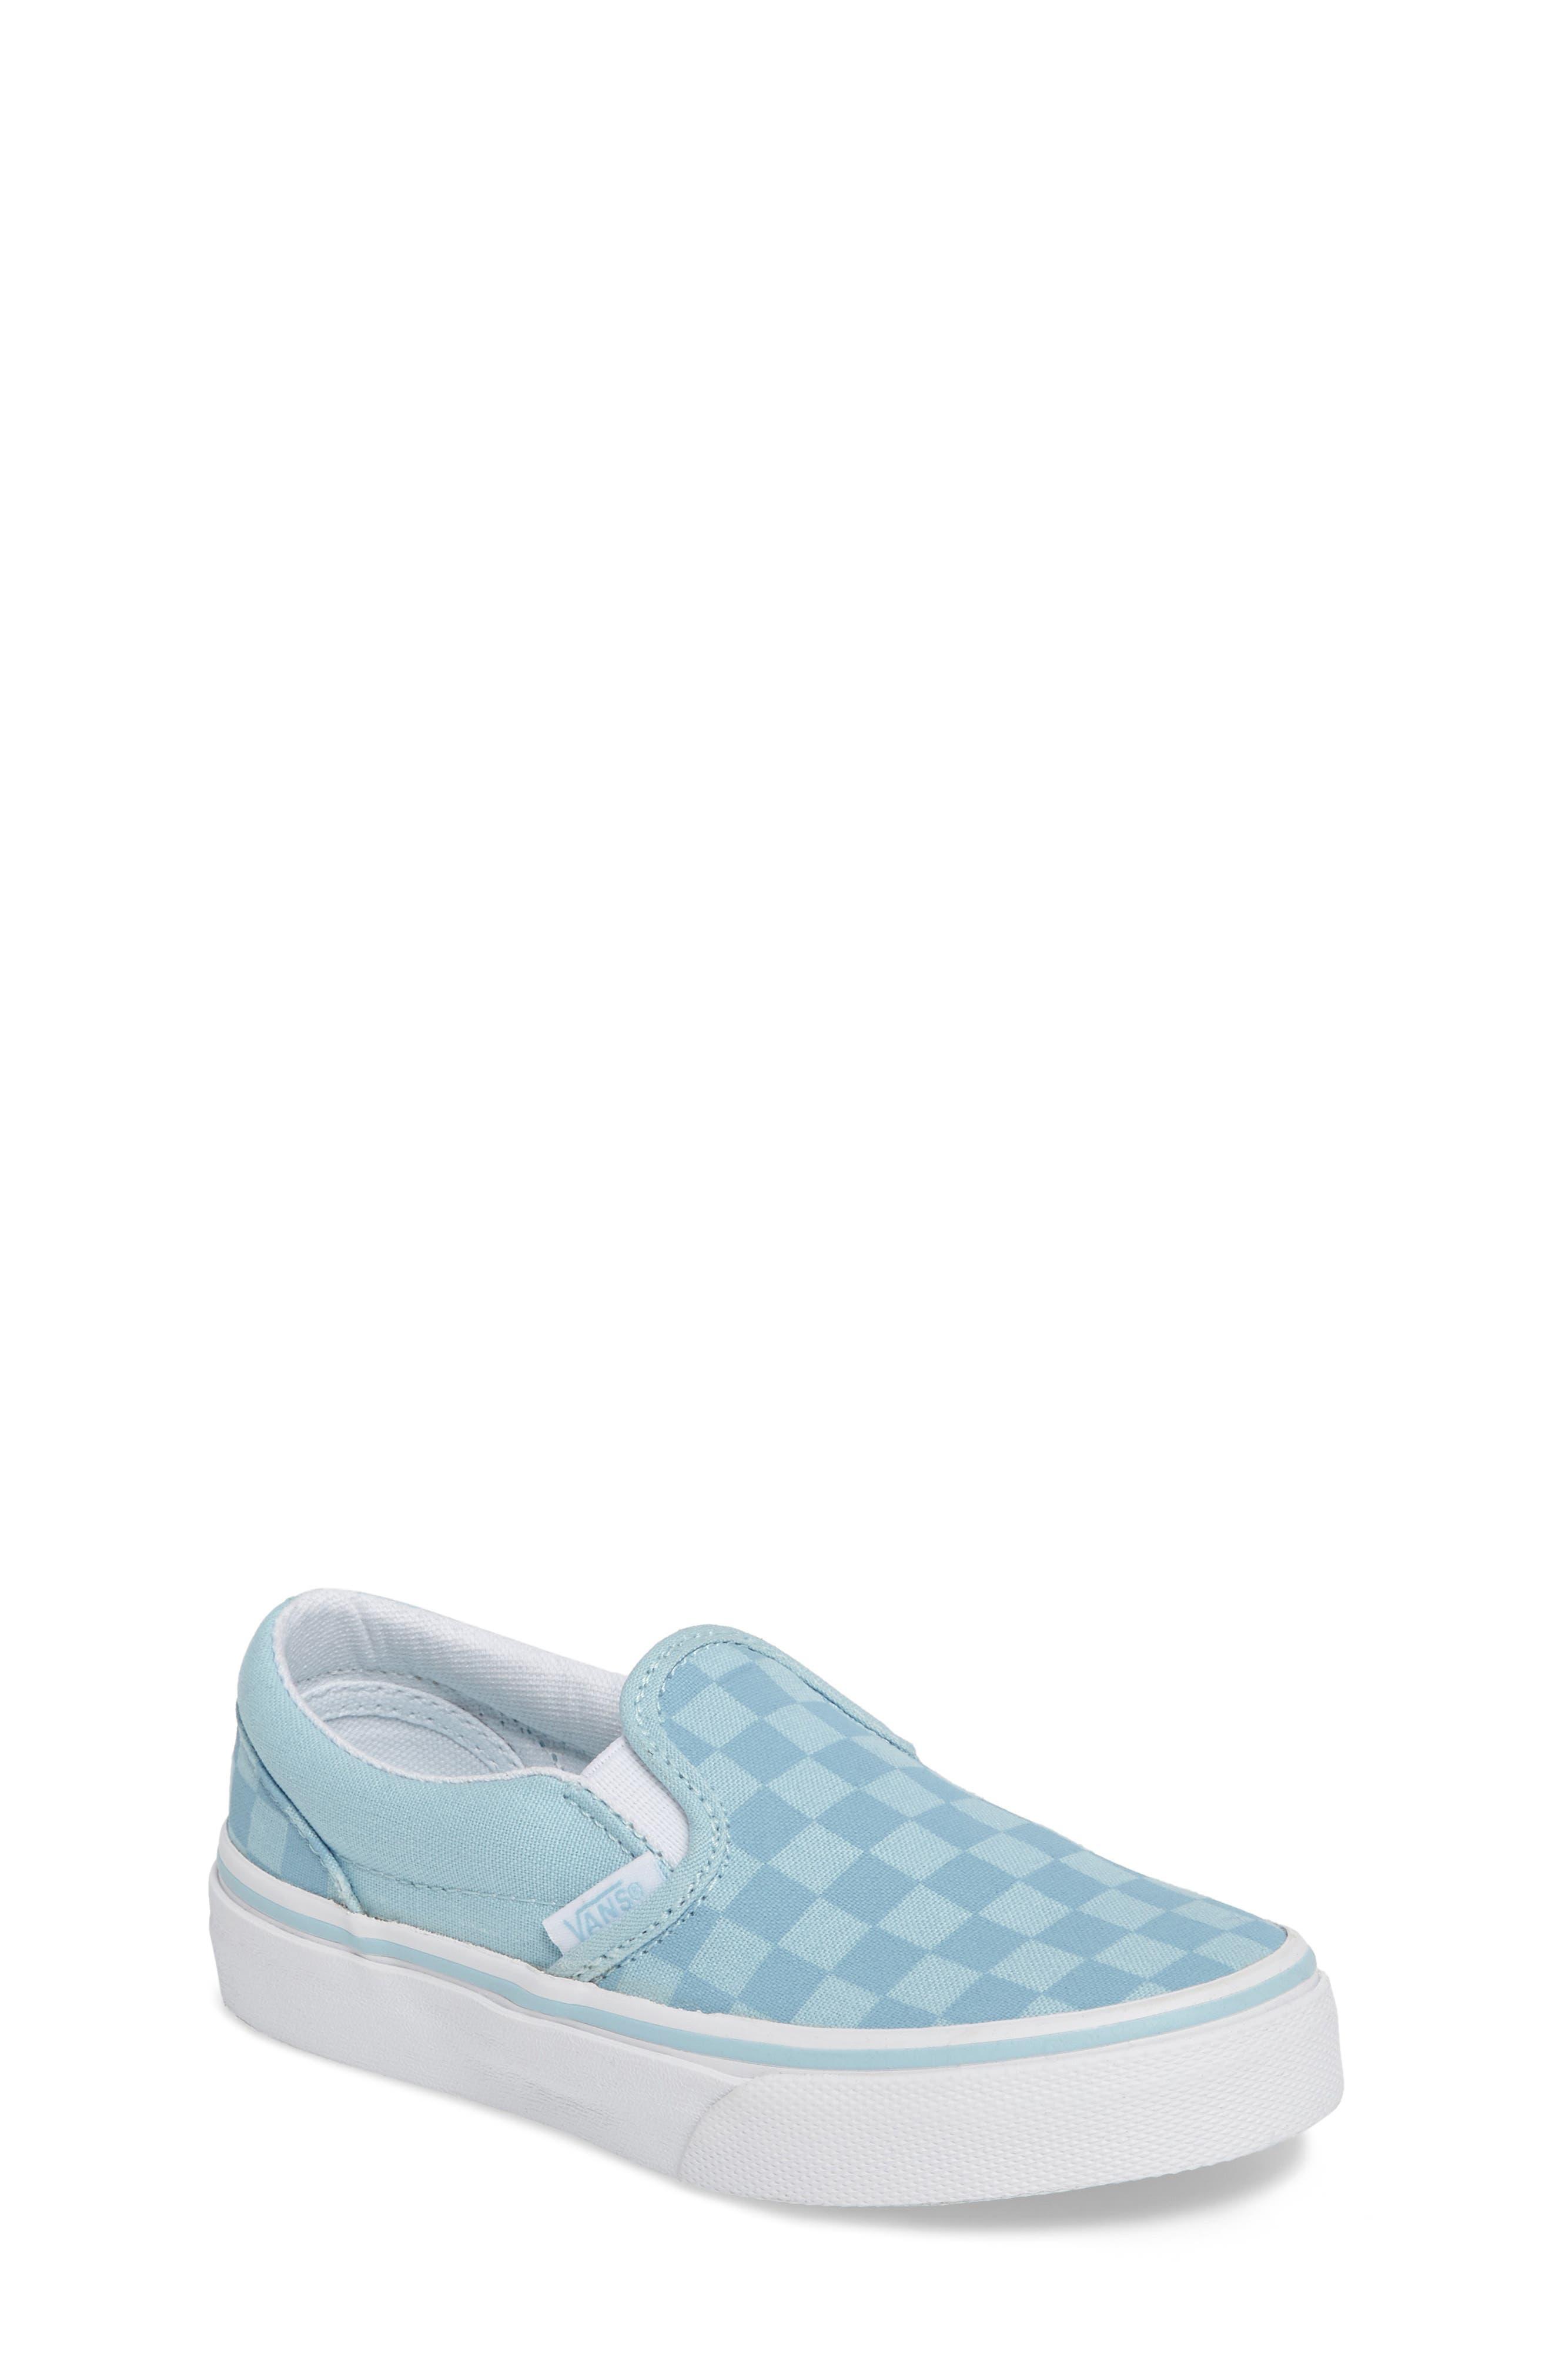 Vans Classic Slip-On Sneaker (Walker, Toddler, Little Kid & Big Kid)